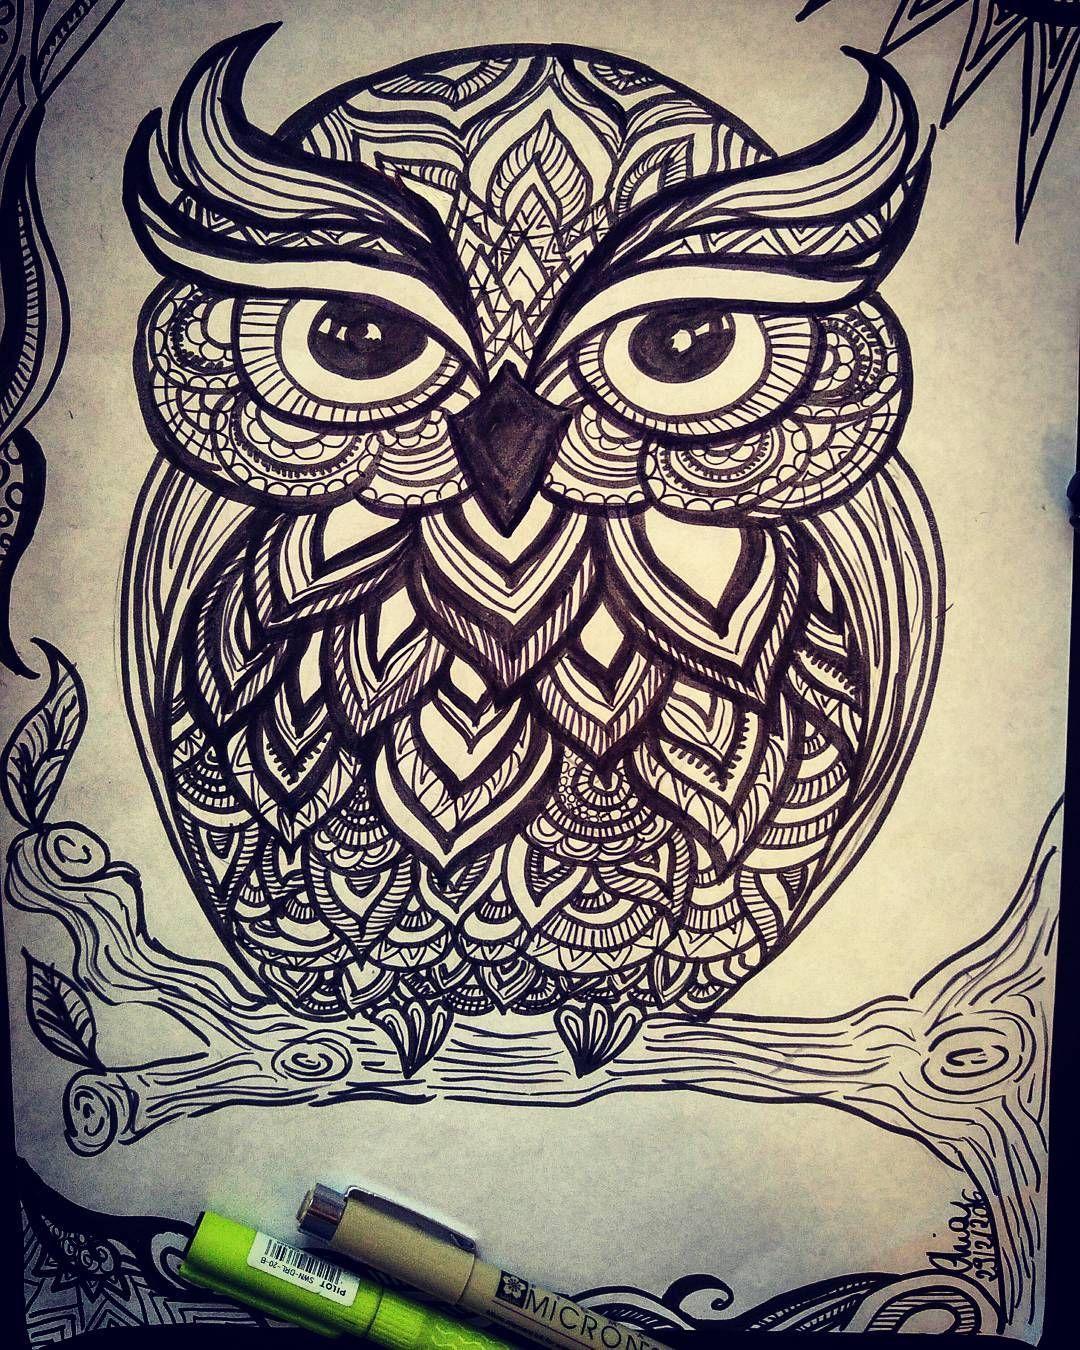 #owlzentangle #owl #doodlesketch #doodle #pen #zentangle #zentagleart #pensketch #sketch #doodle